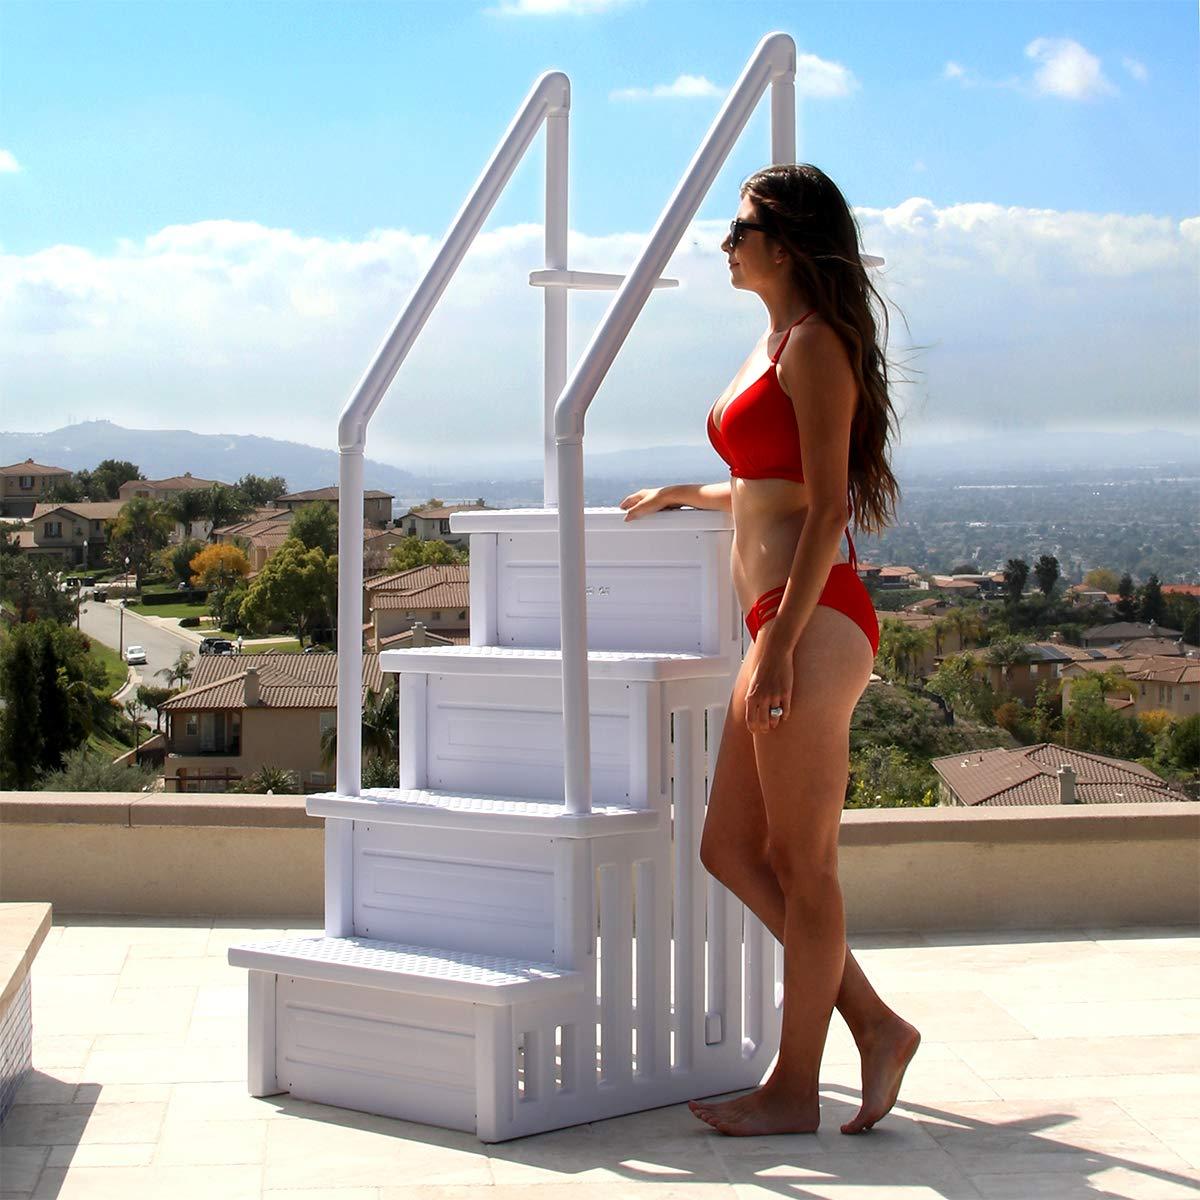 XtremepowerUS 75137-1 Pool Ladder, White by XtremepowerUS